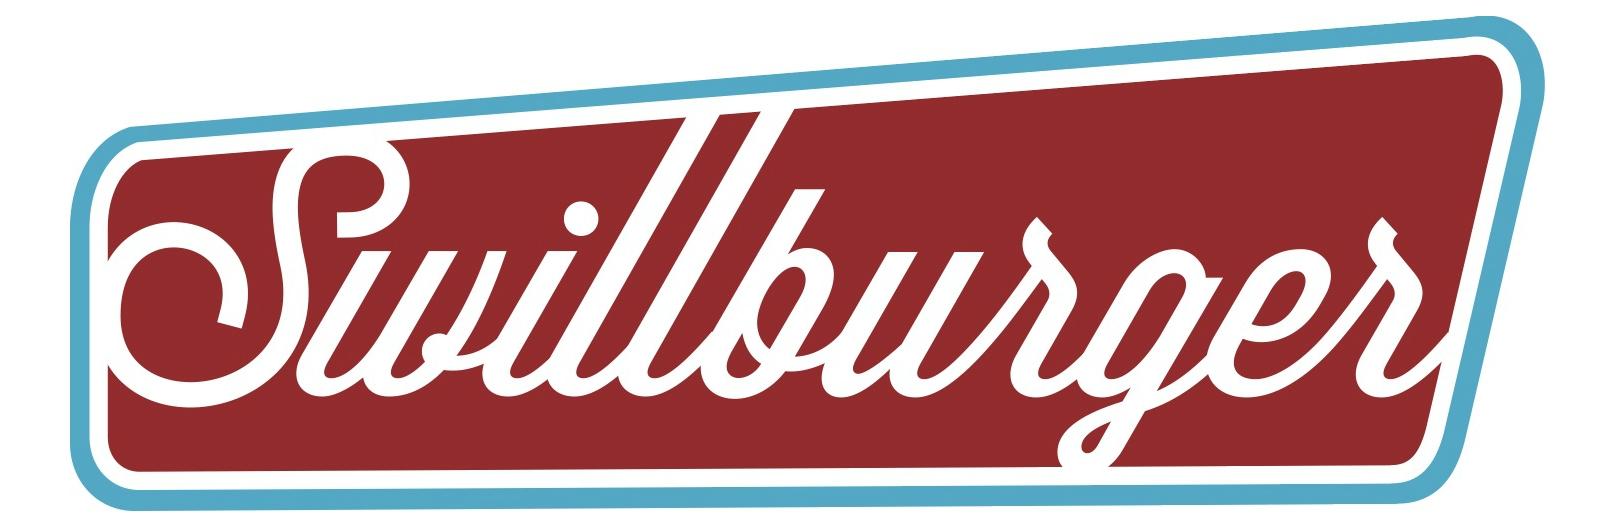 Swillburger_vector.jpg